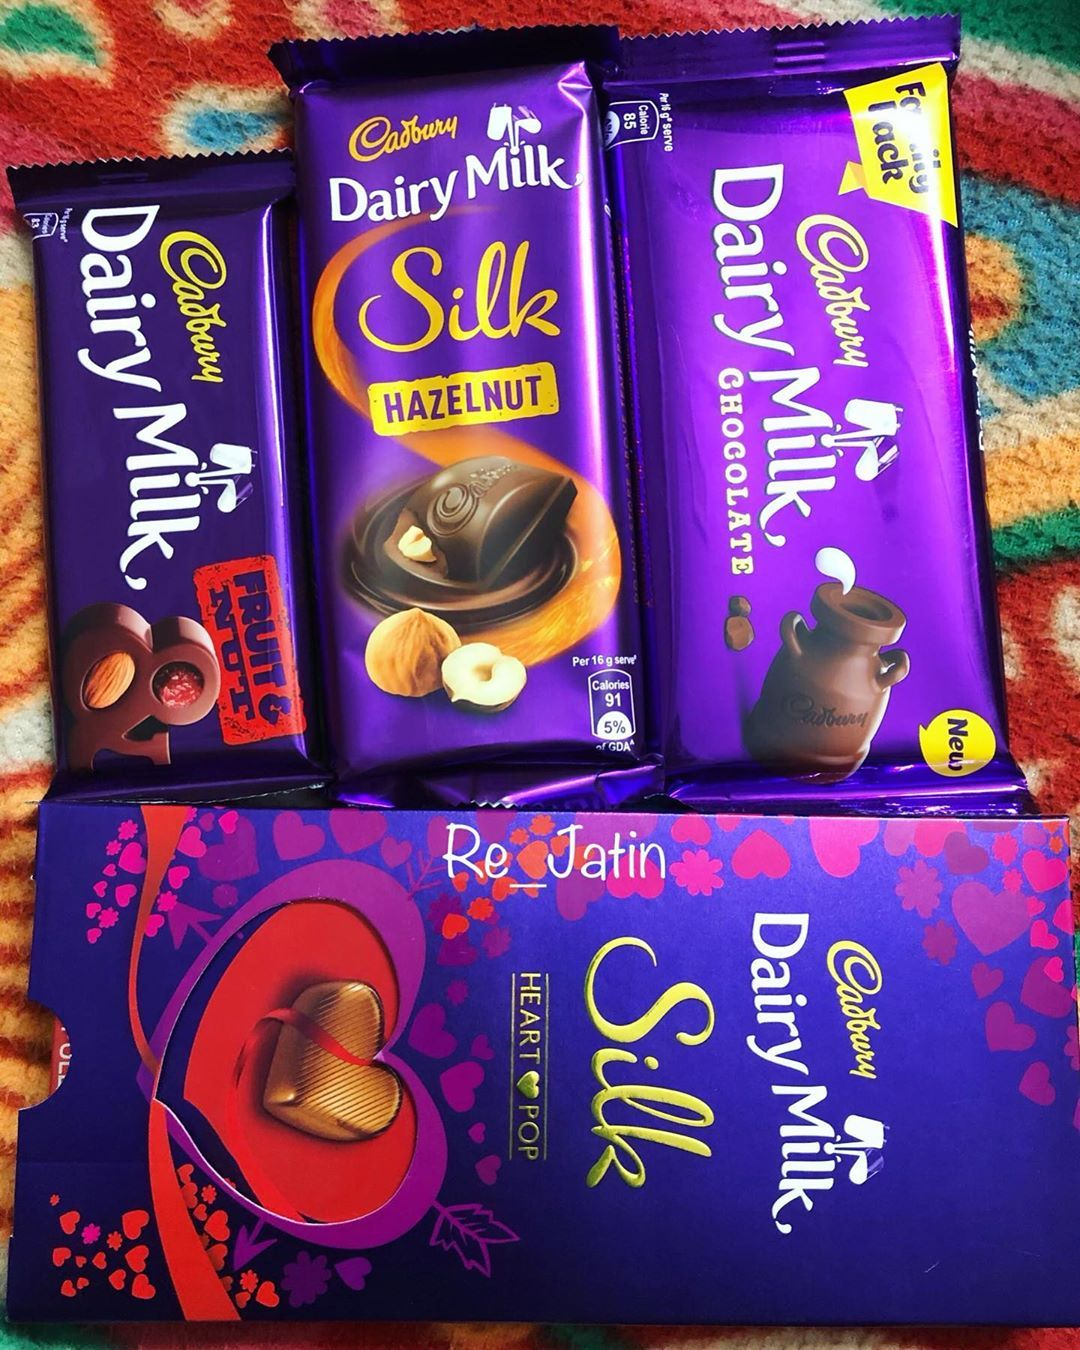 Happychocolateday Apko Aur Apki Gf Ko Re Jatin Dairy Milk Silk Cadbury Dairy Milk Dairy Milk Chocolate